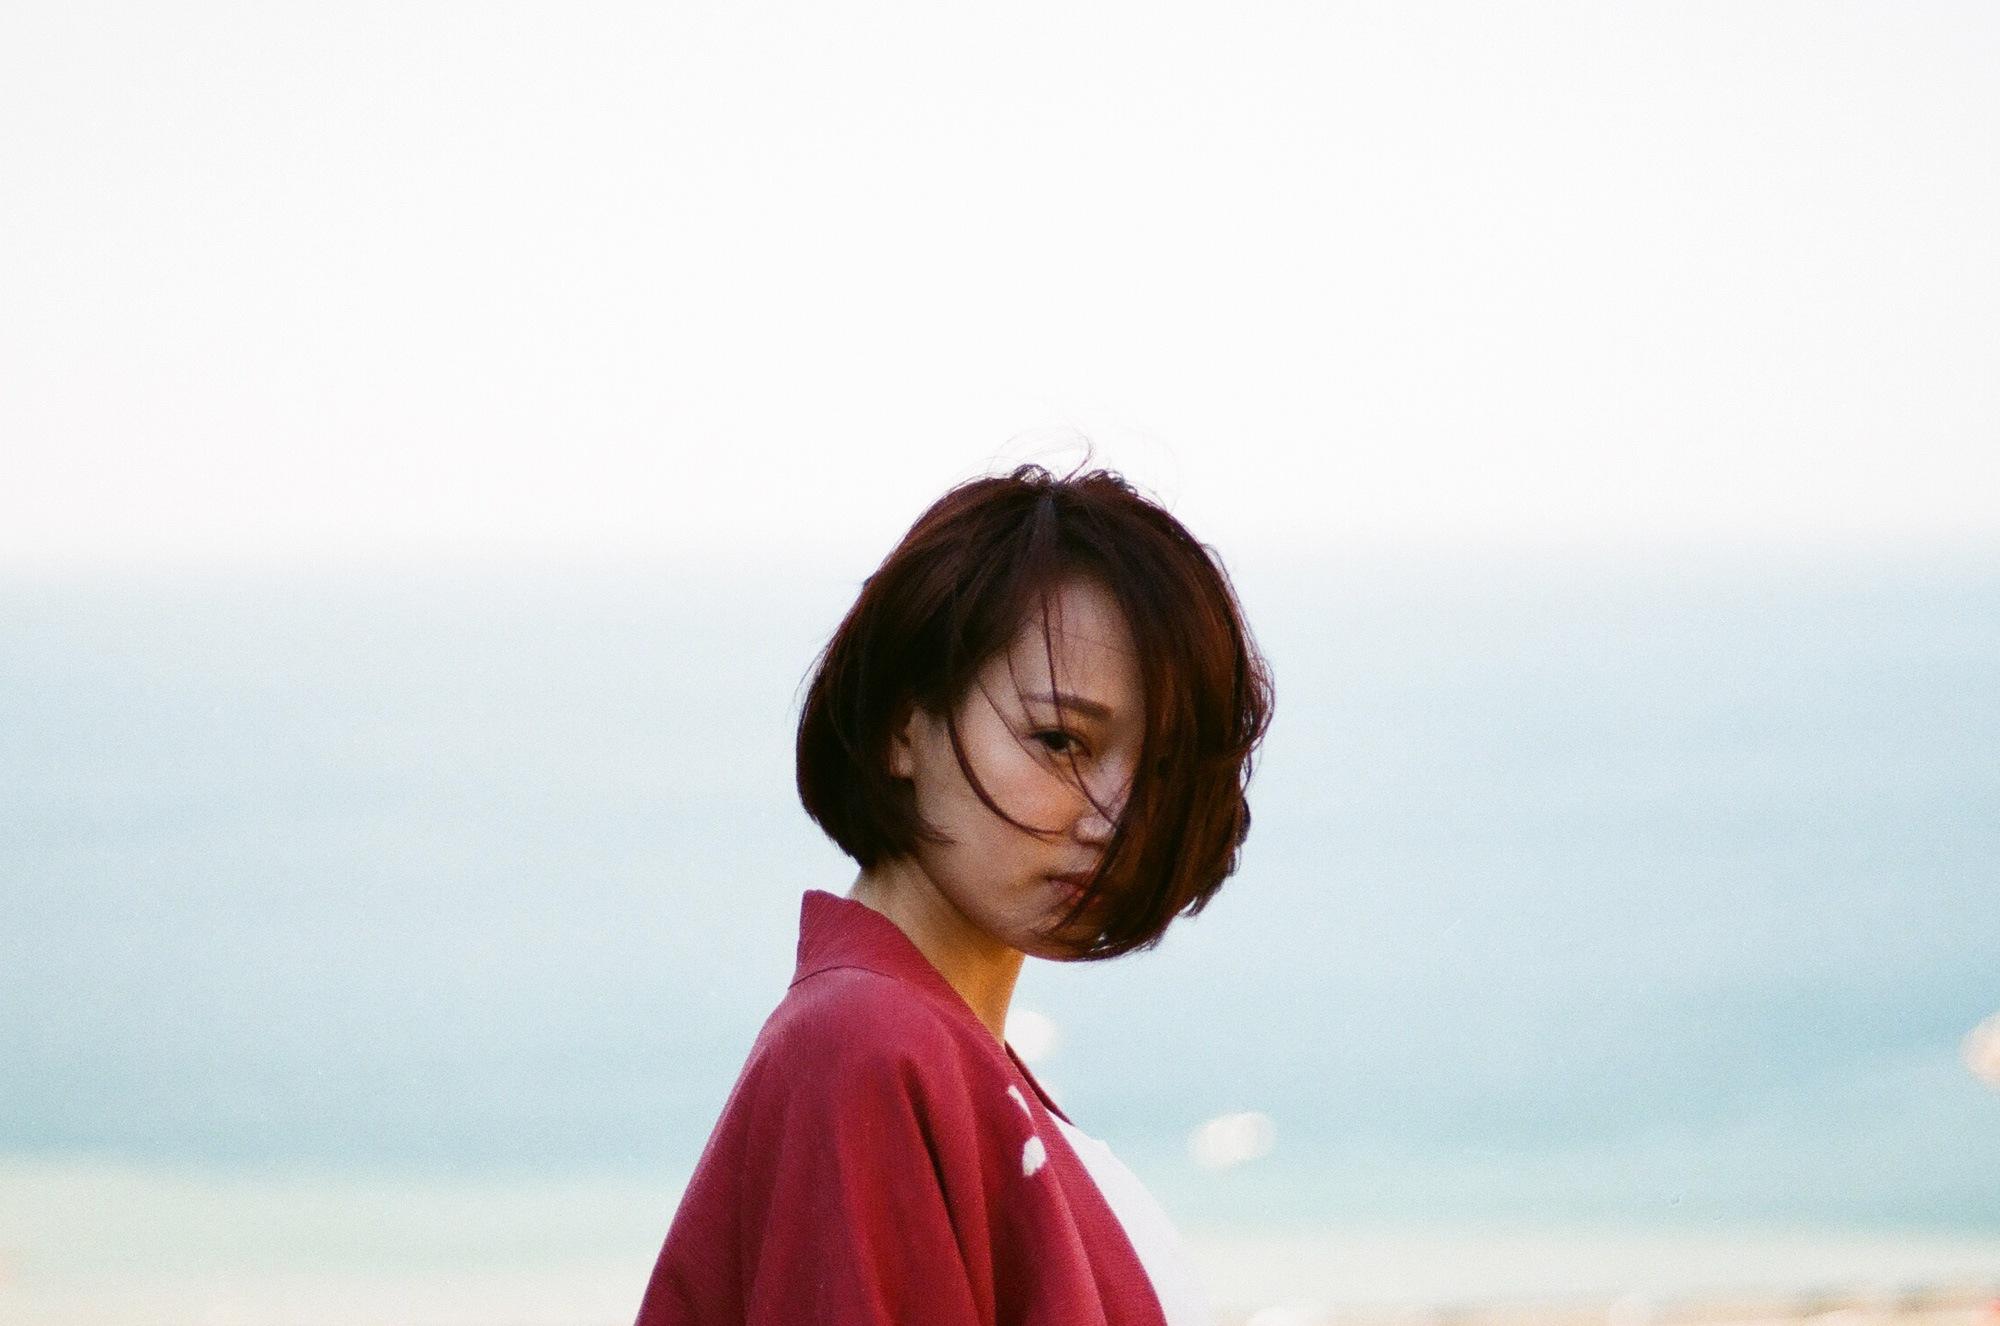 girl by ja_shang_tang